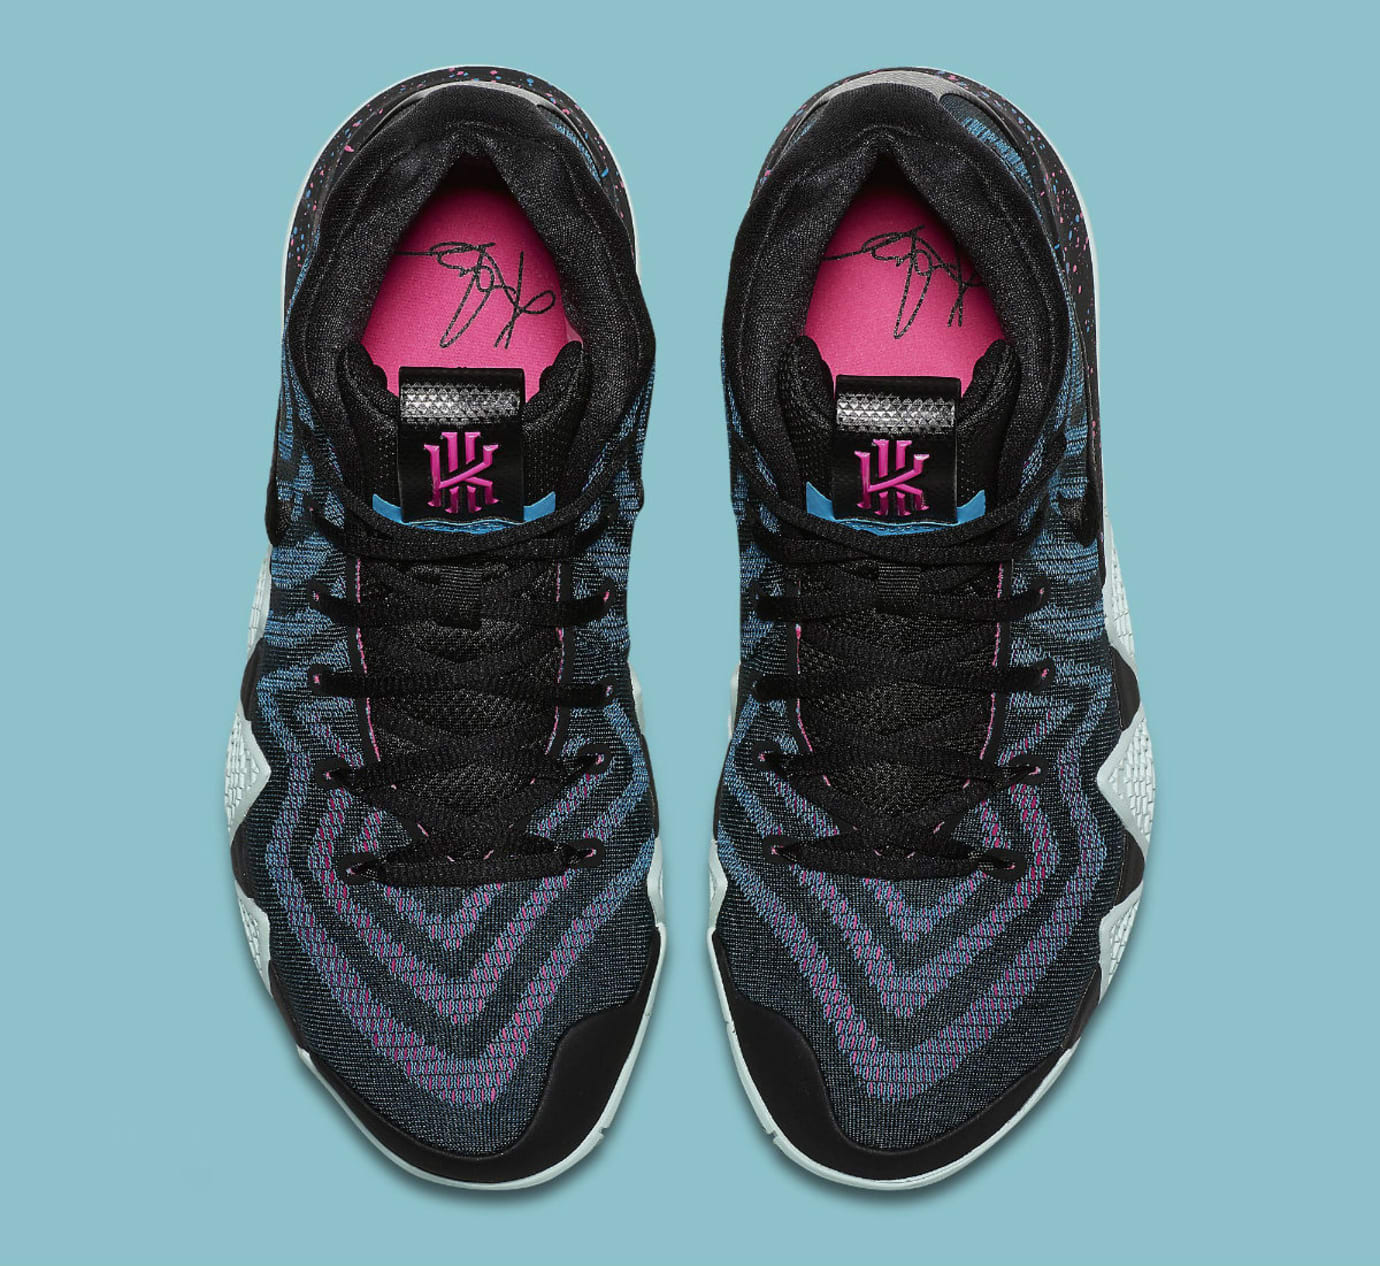 d51e22426d41 Image via Nike Nike Kyrie 4 Black Laser Fuchsia Release Date 943807-007 Top